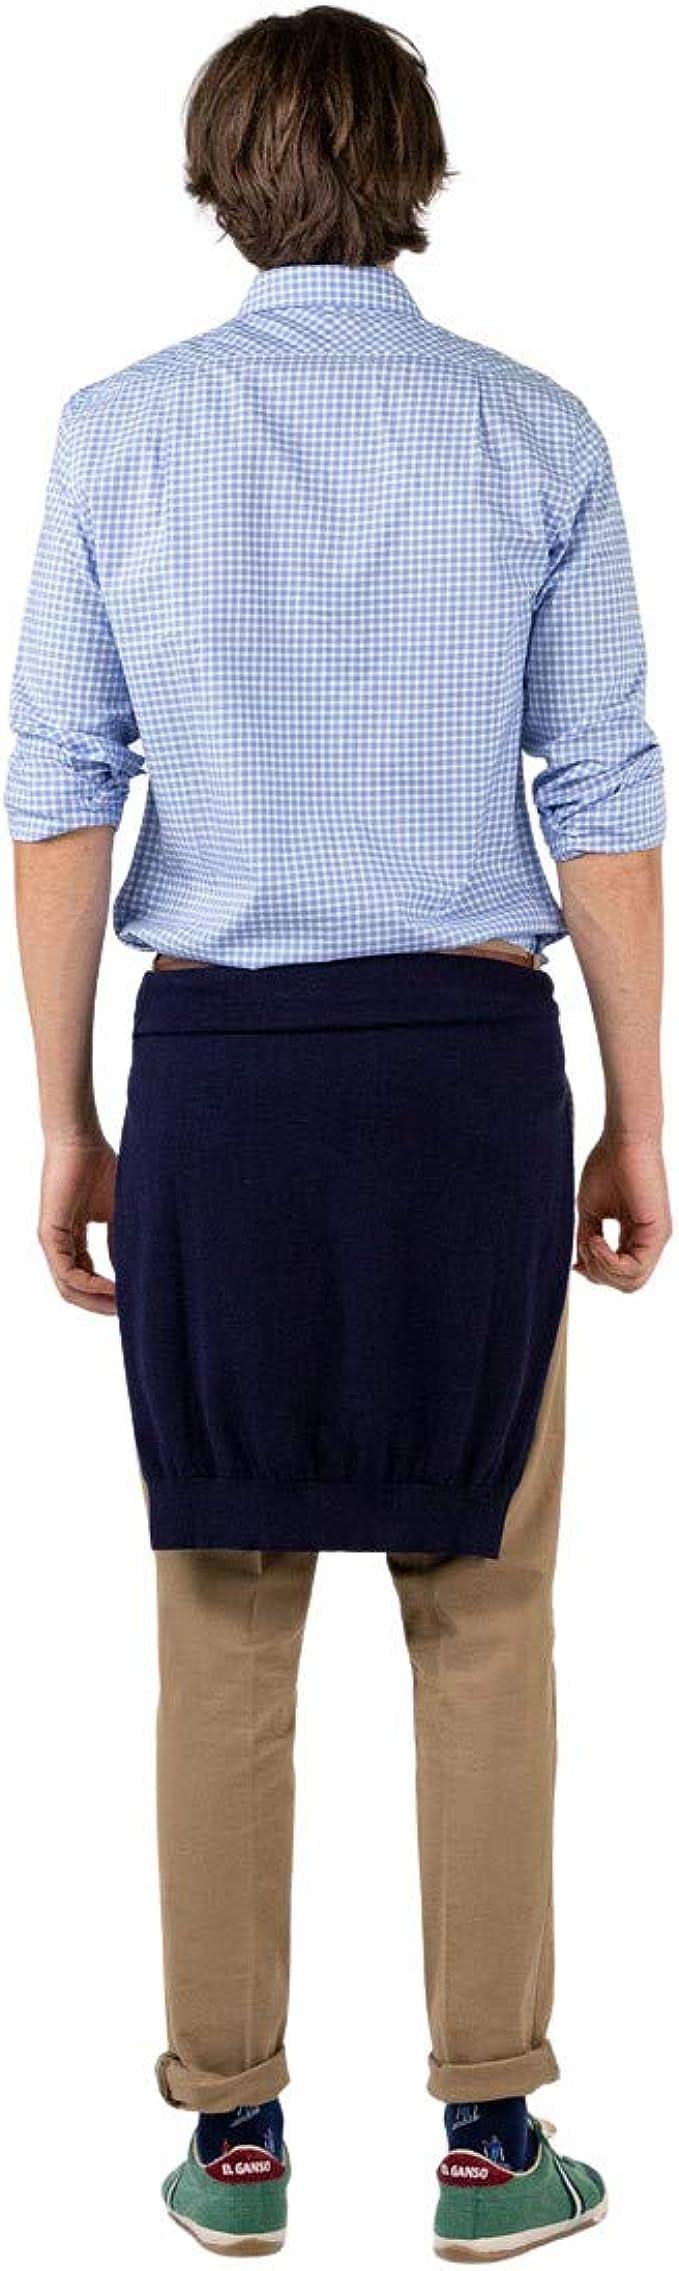 El Ganso Camisa Cuadro Tattersall Twill Azul Casual